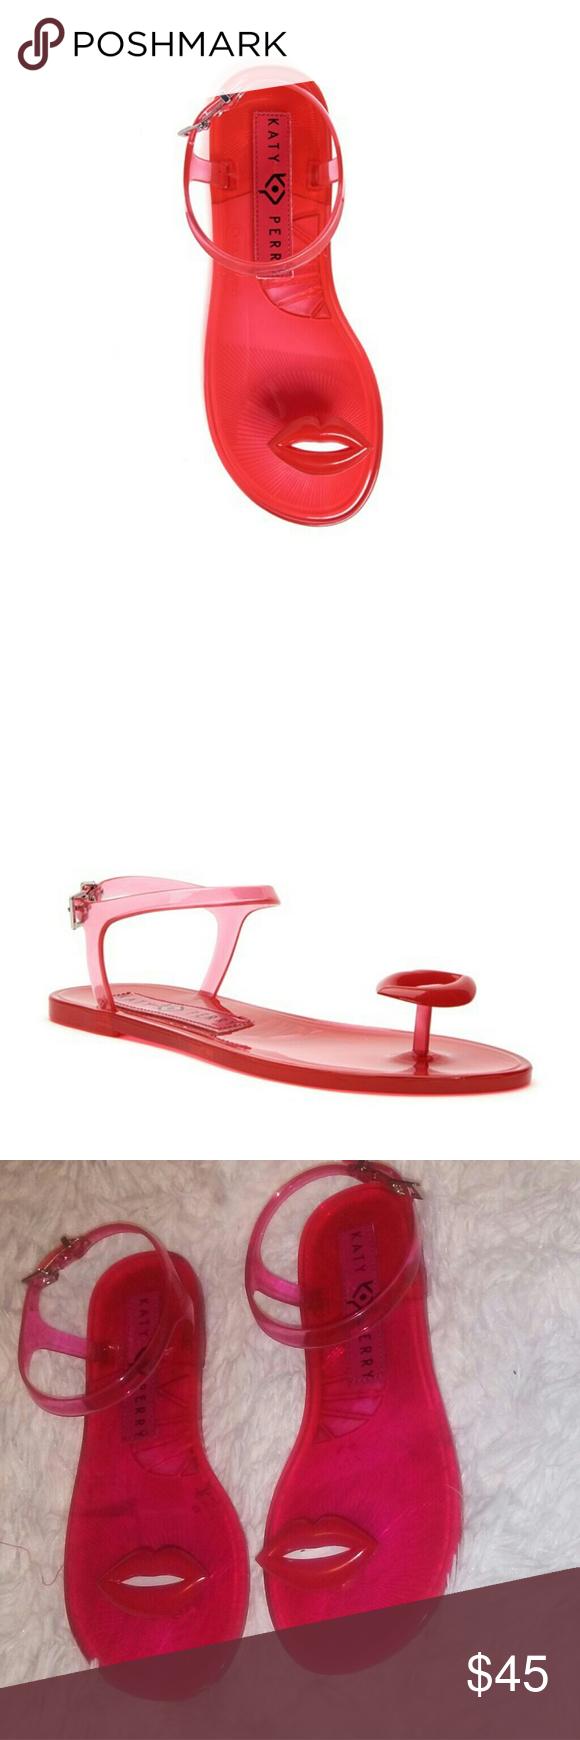 NWOB Katy Perry The Geli Lips Sandals